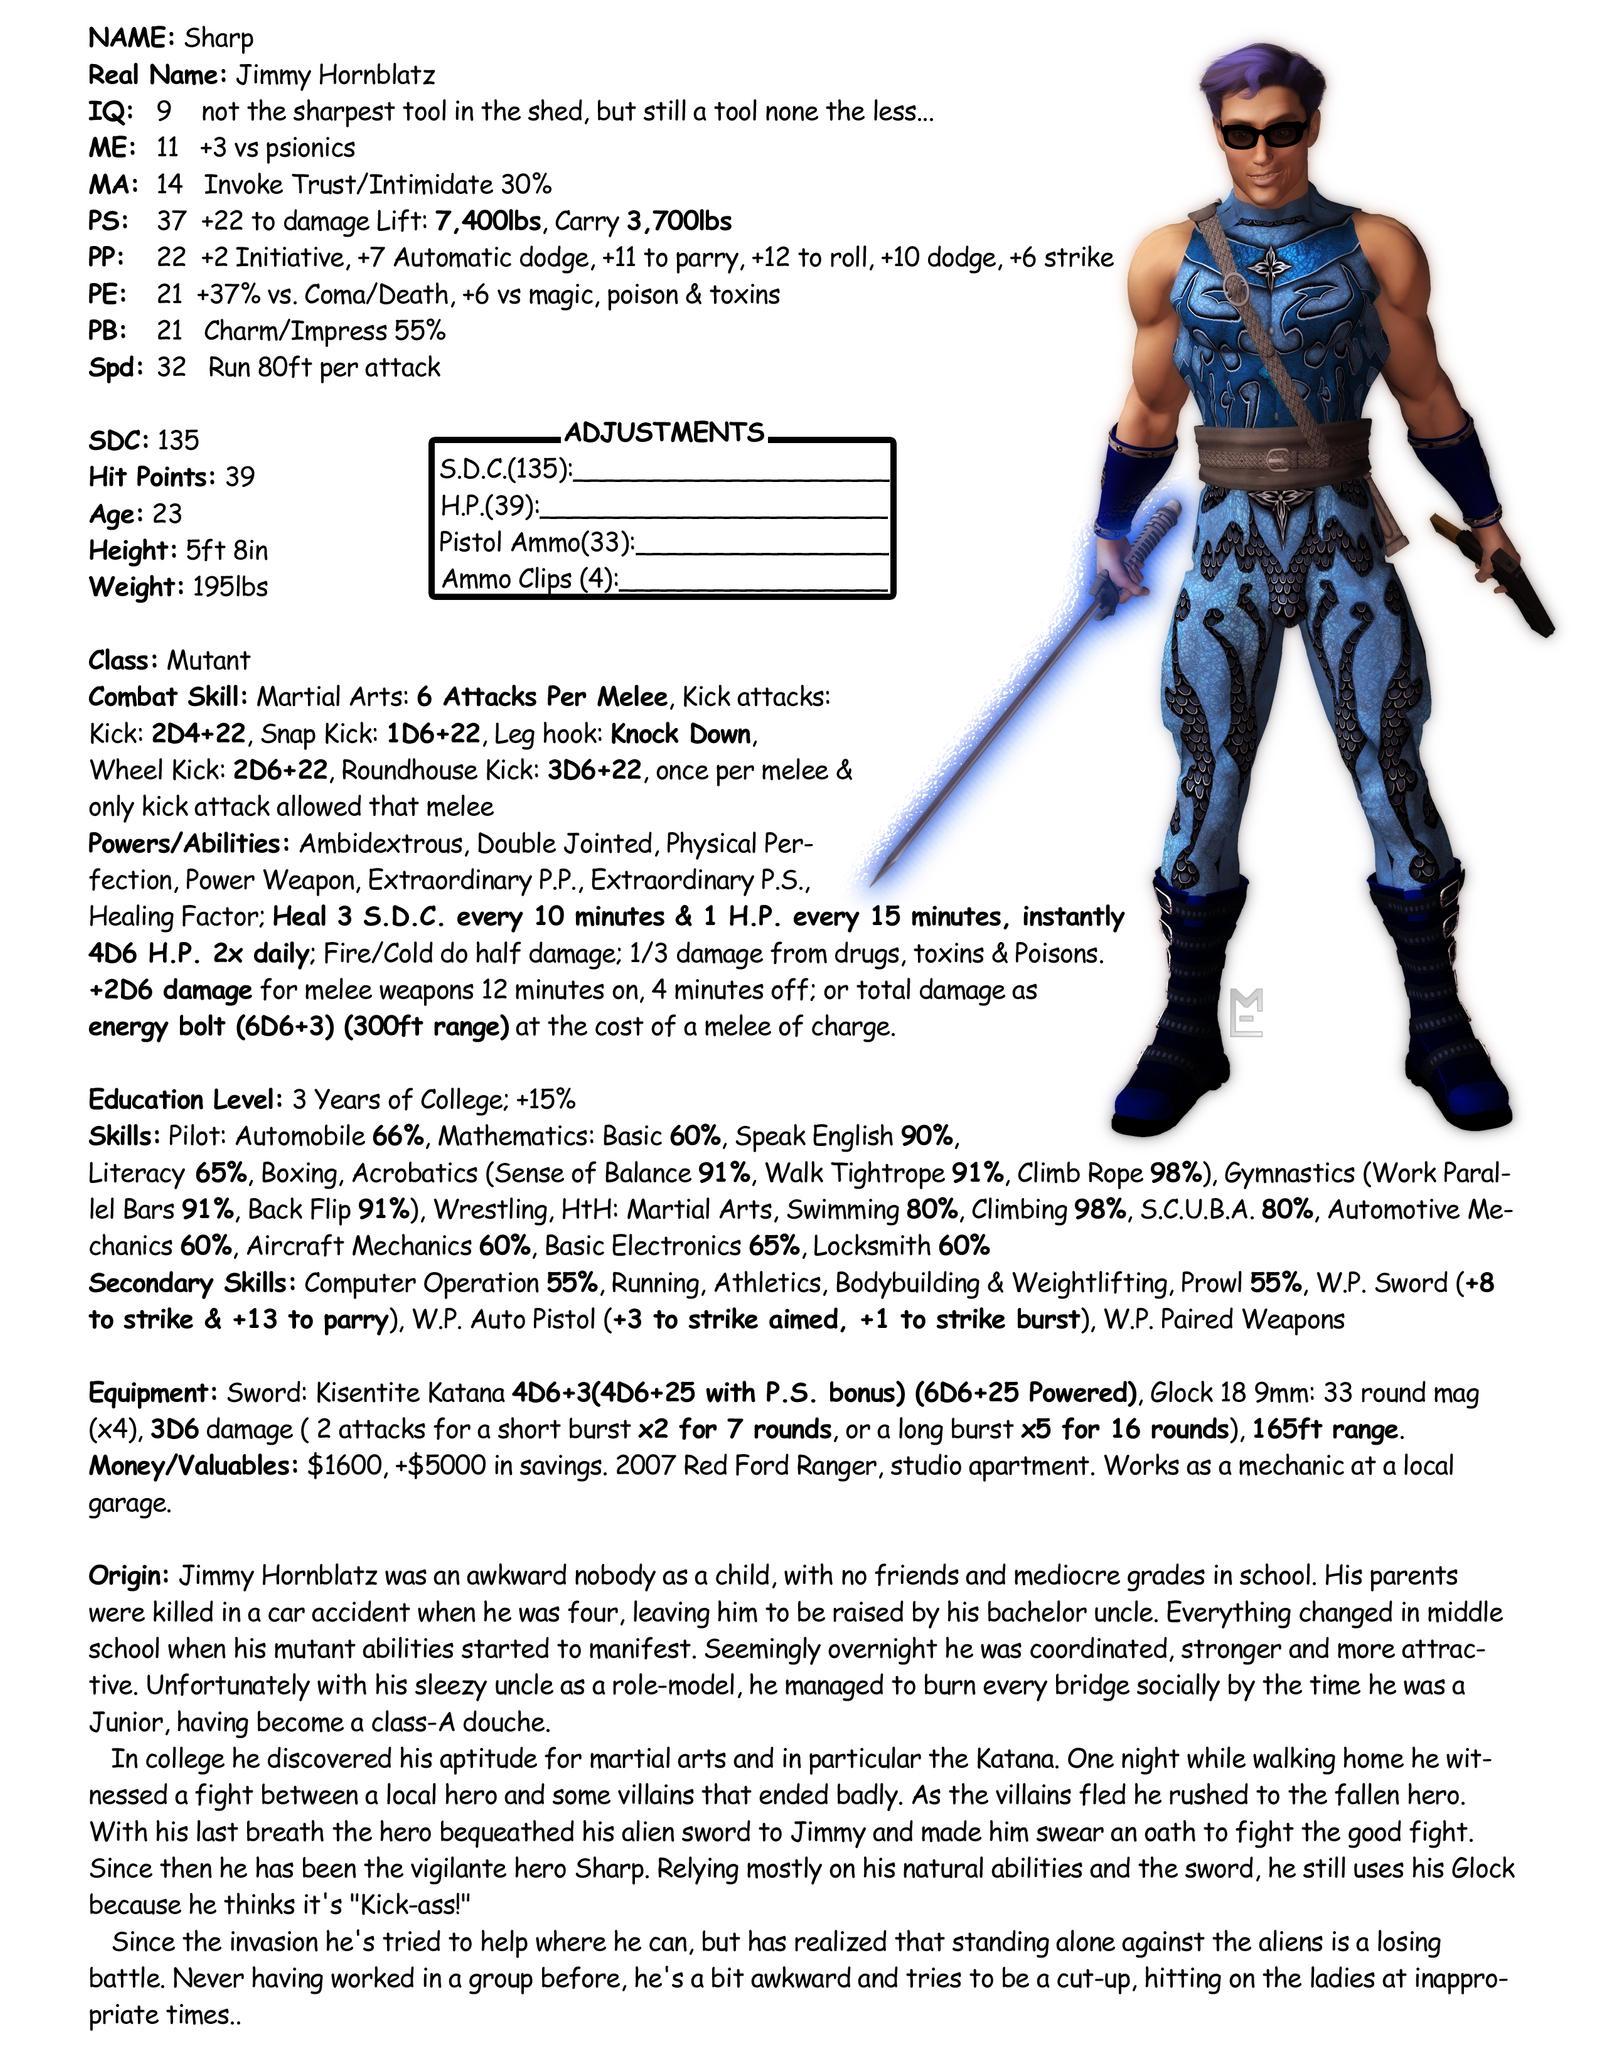 Sharp Character Sheet